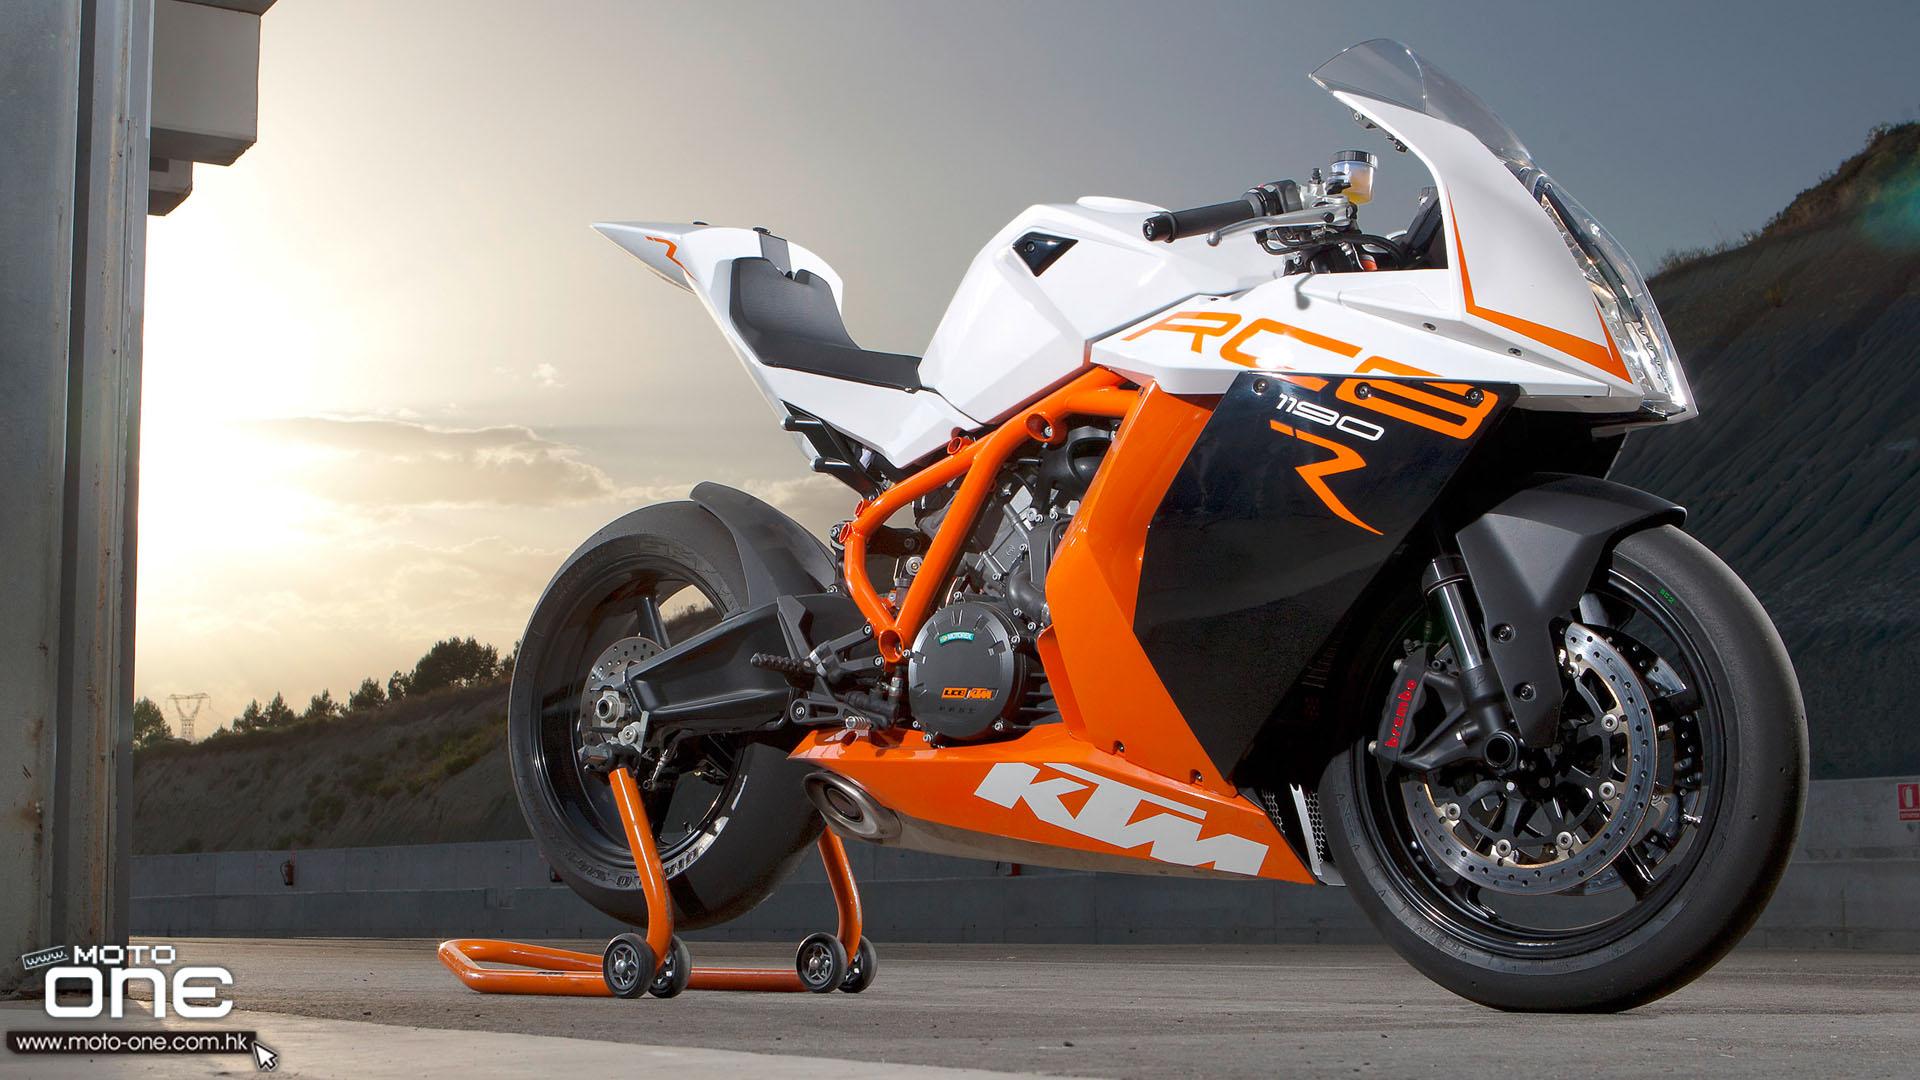 2015 KTM 1190 RC8 R Photo 1920x1080